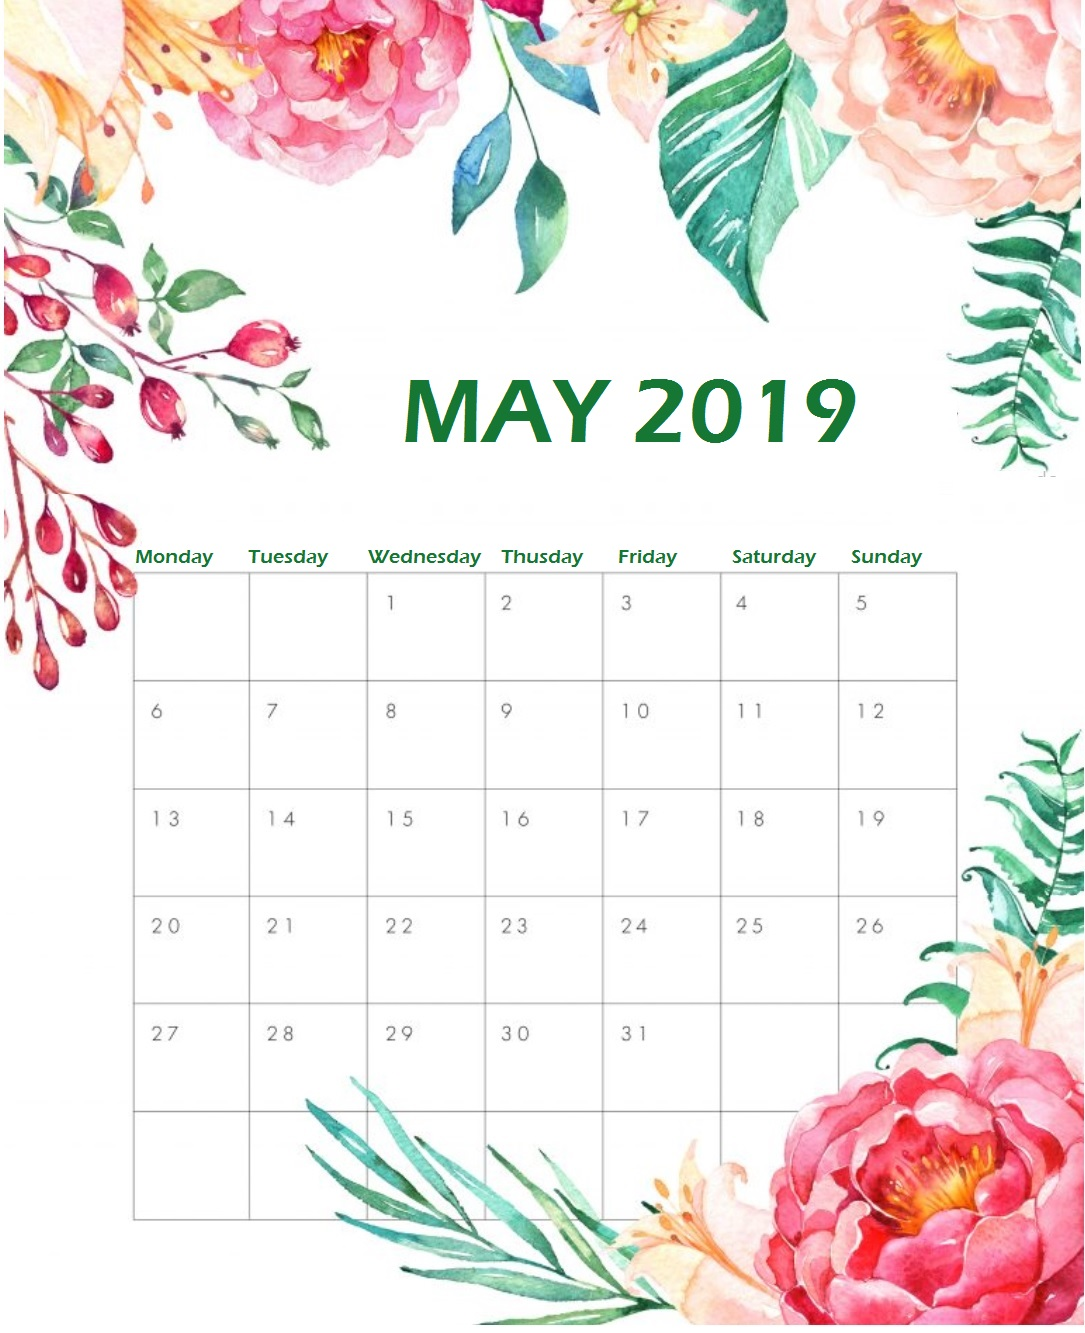 Printable May 2019 Floral Calendar